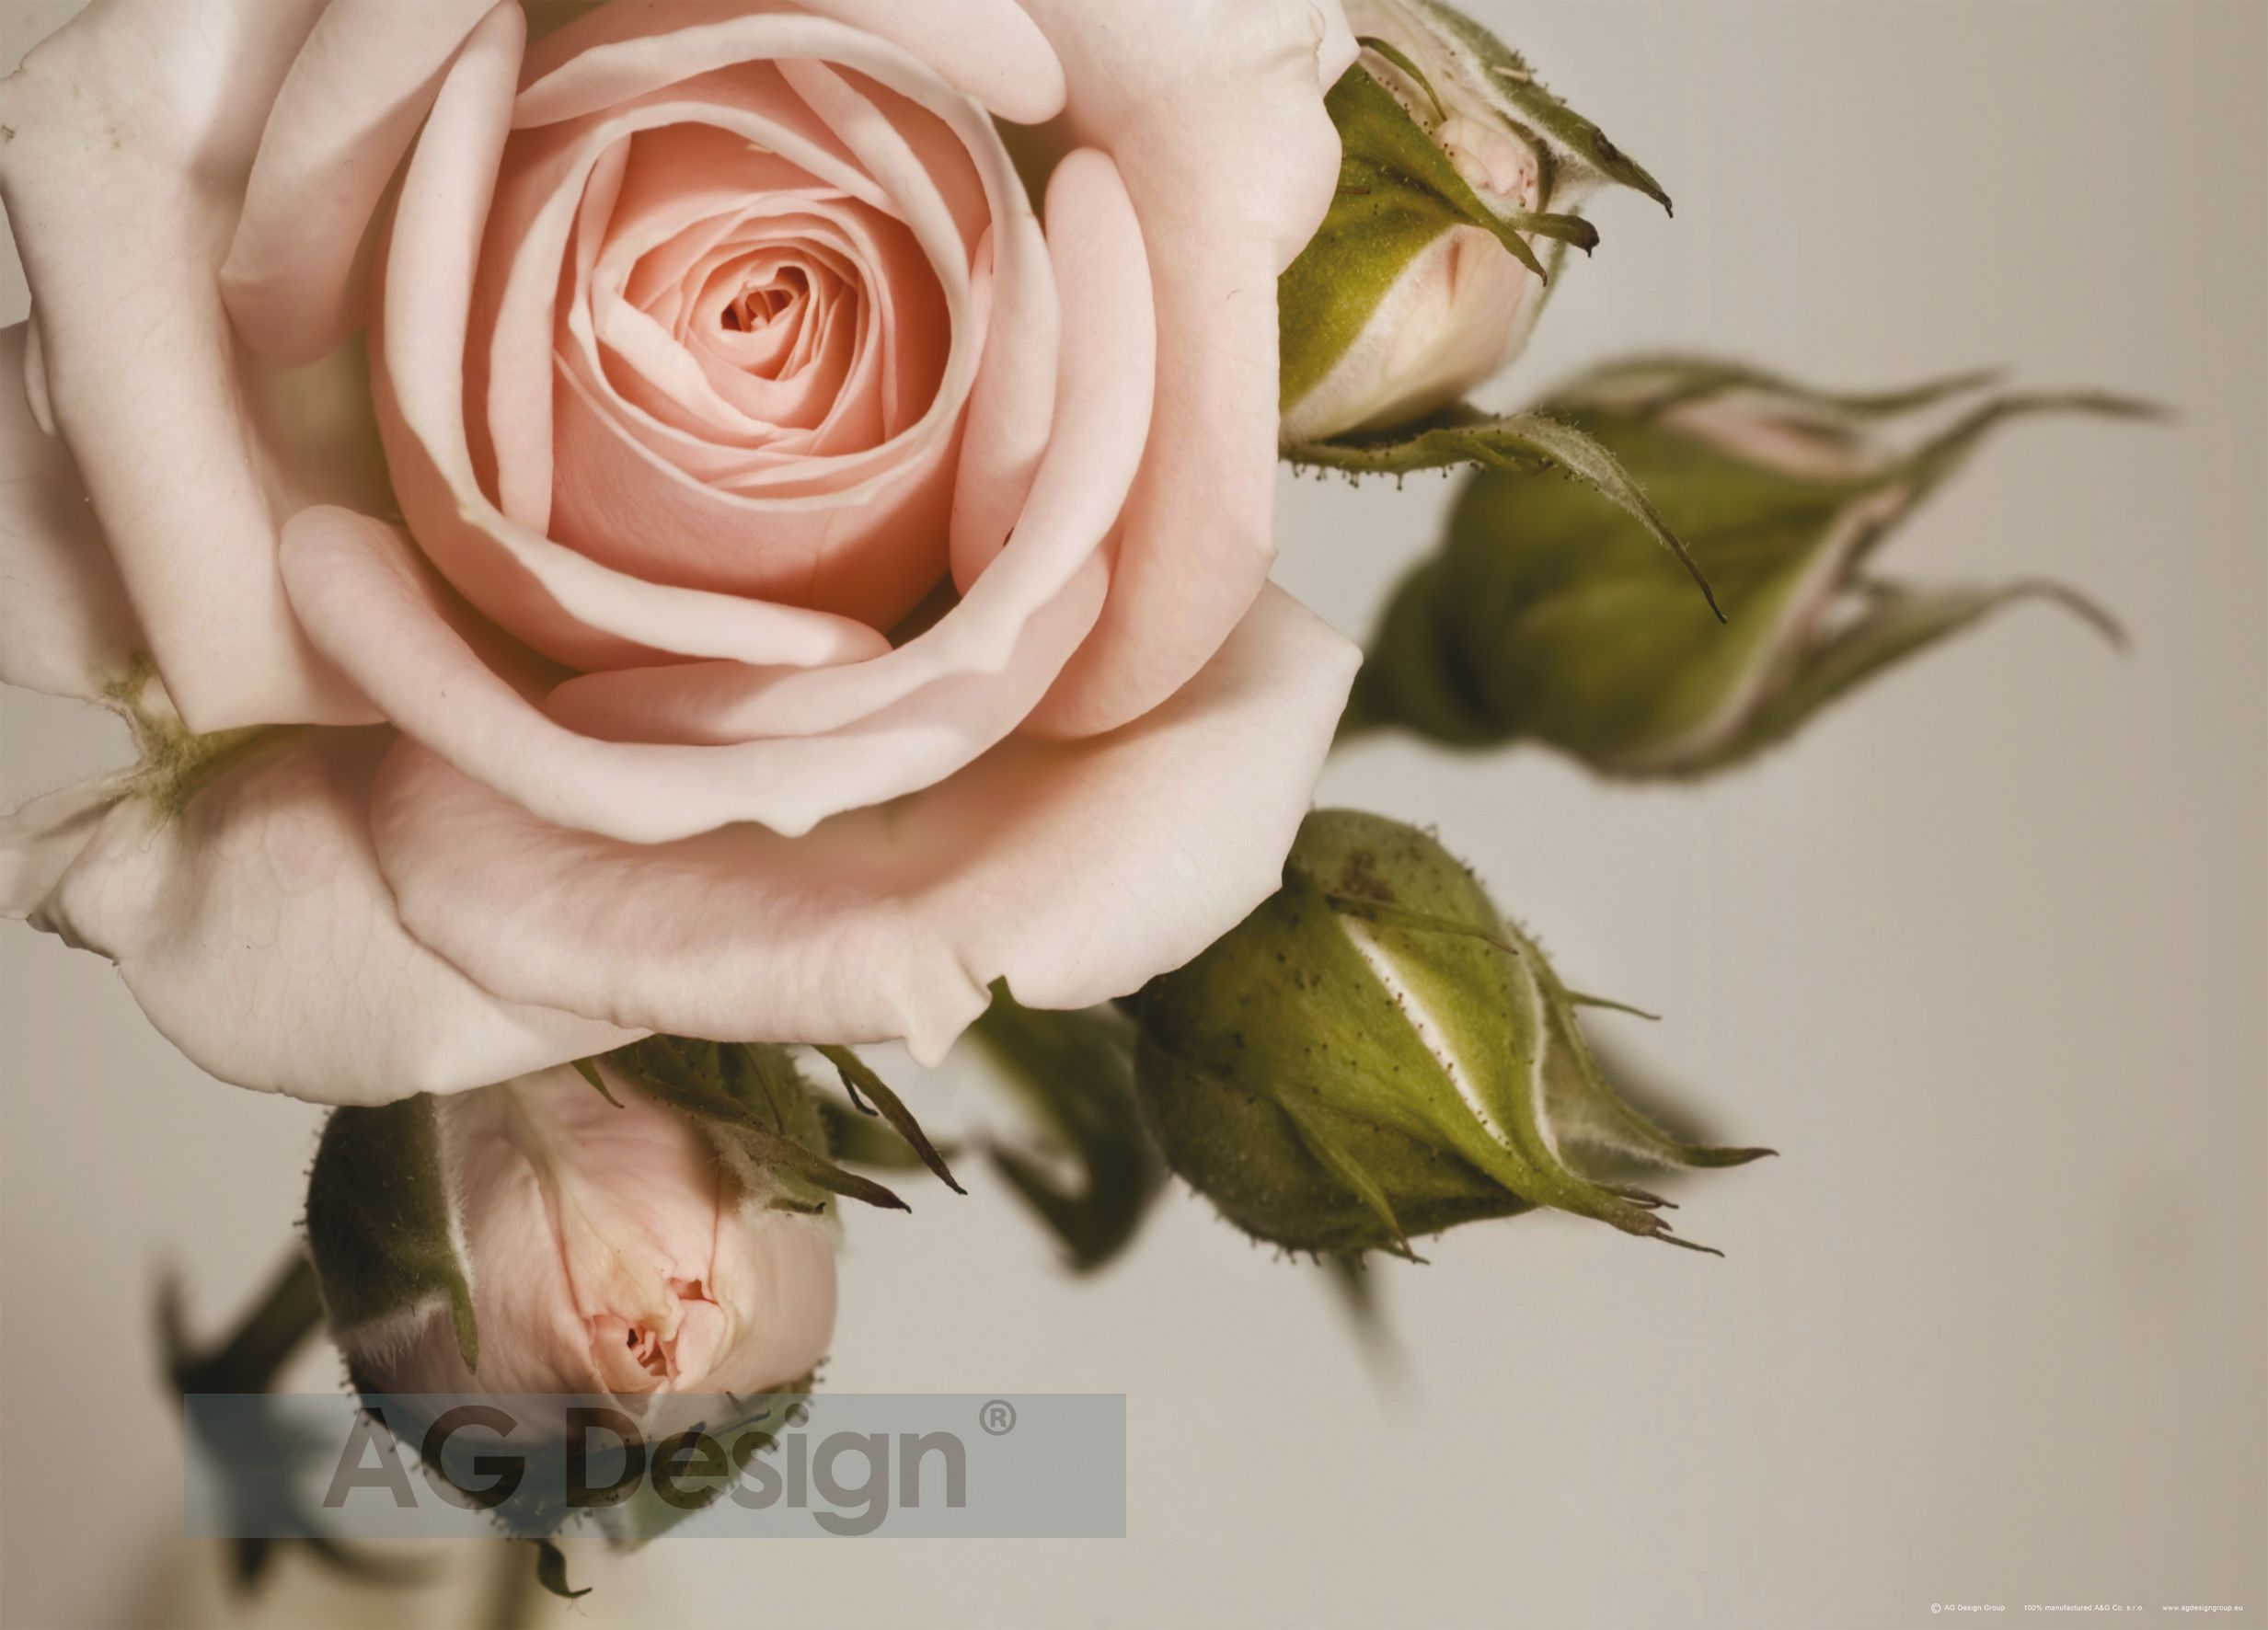 Fototapeta jednodílná - růže